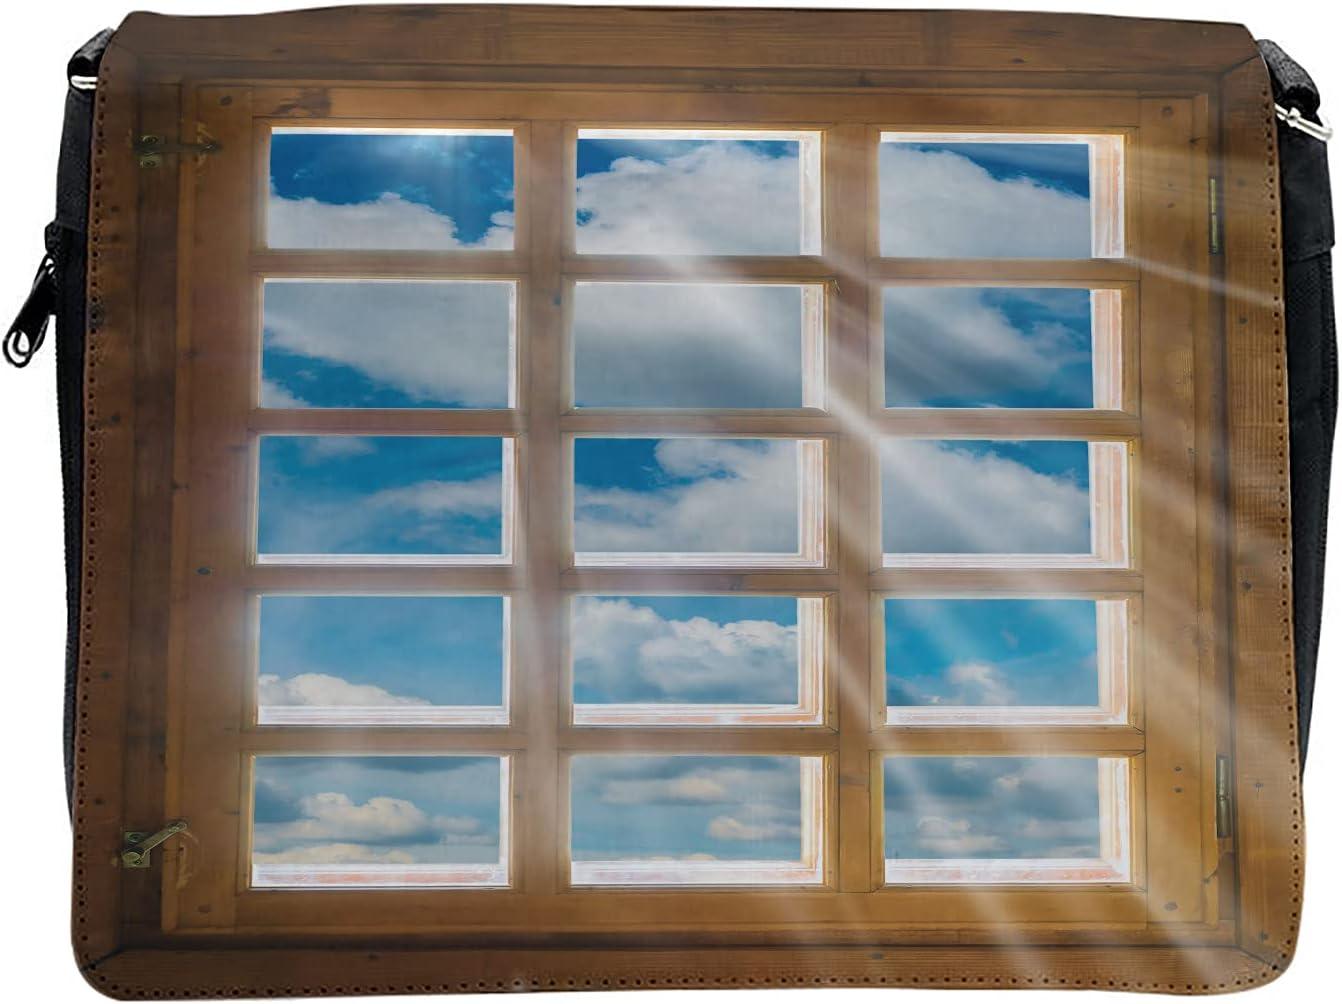 Ambesonne Rustic Cross Body Messenger Bag, Window with Sunbeams, Unisex